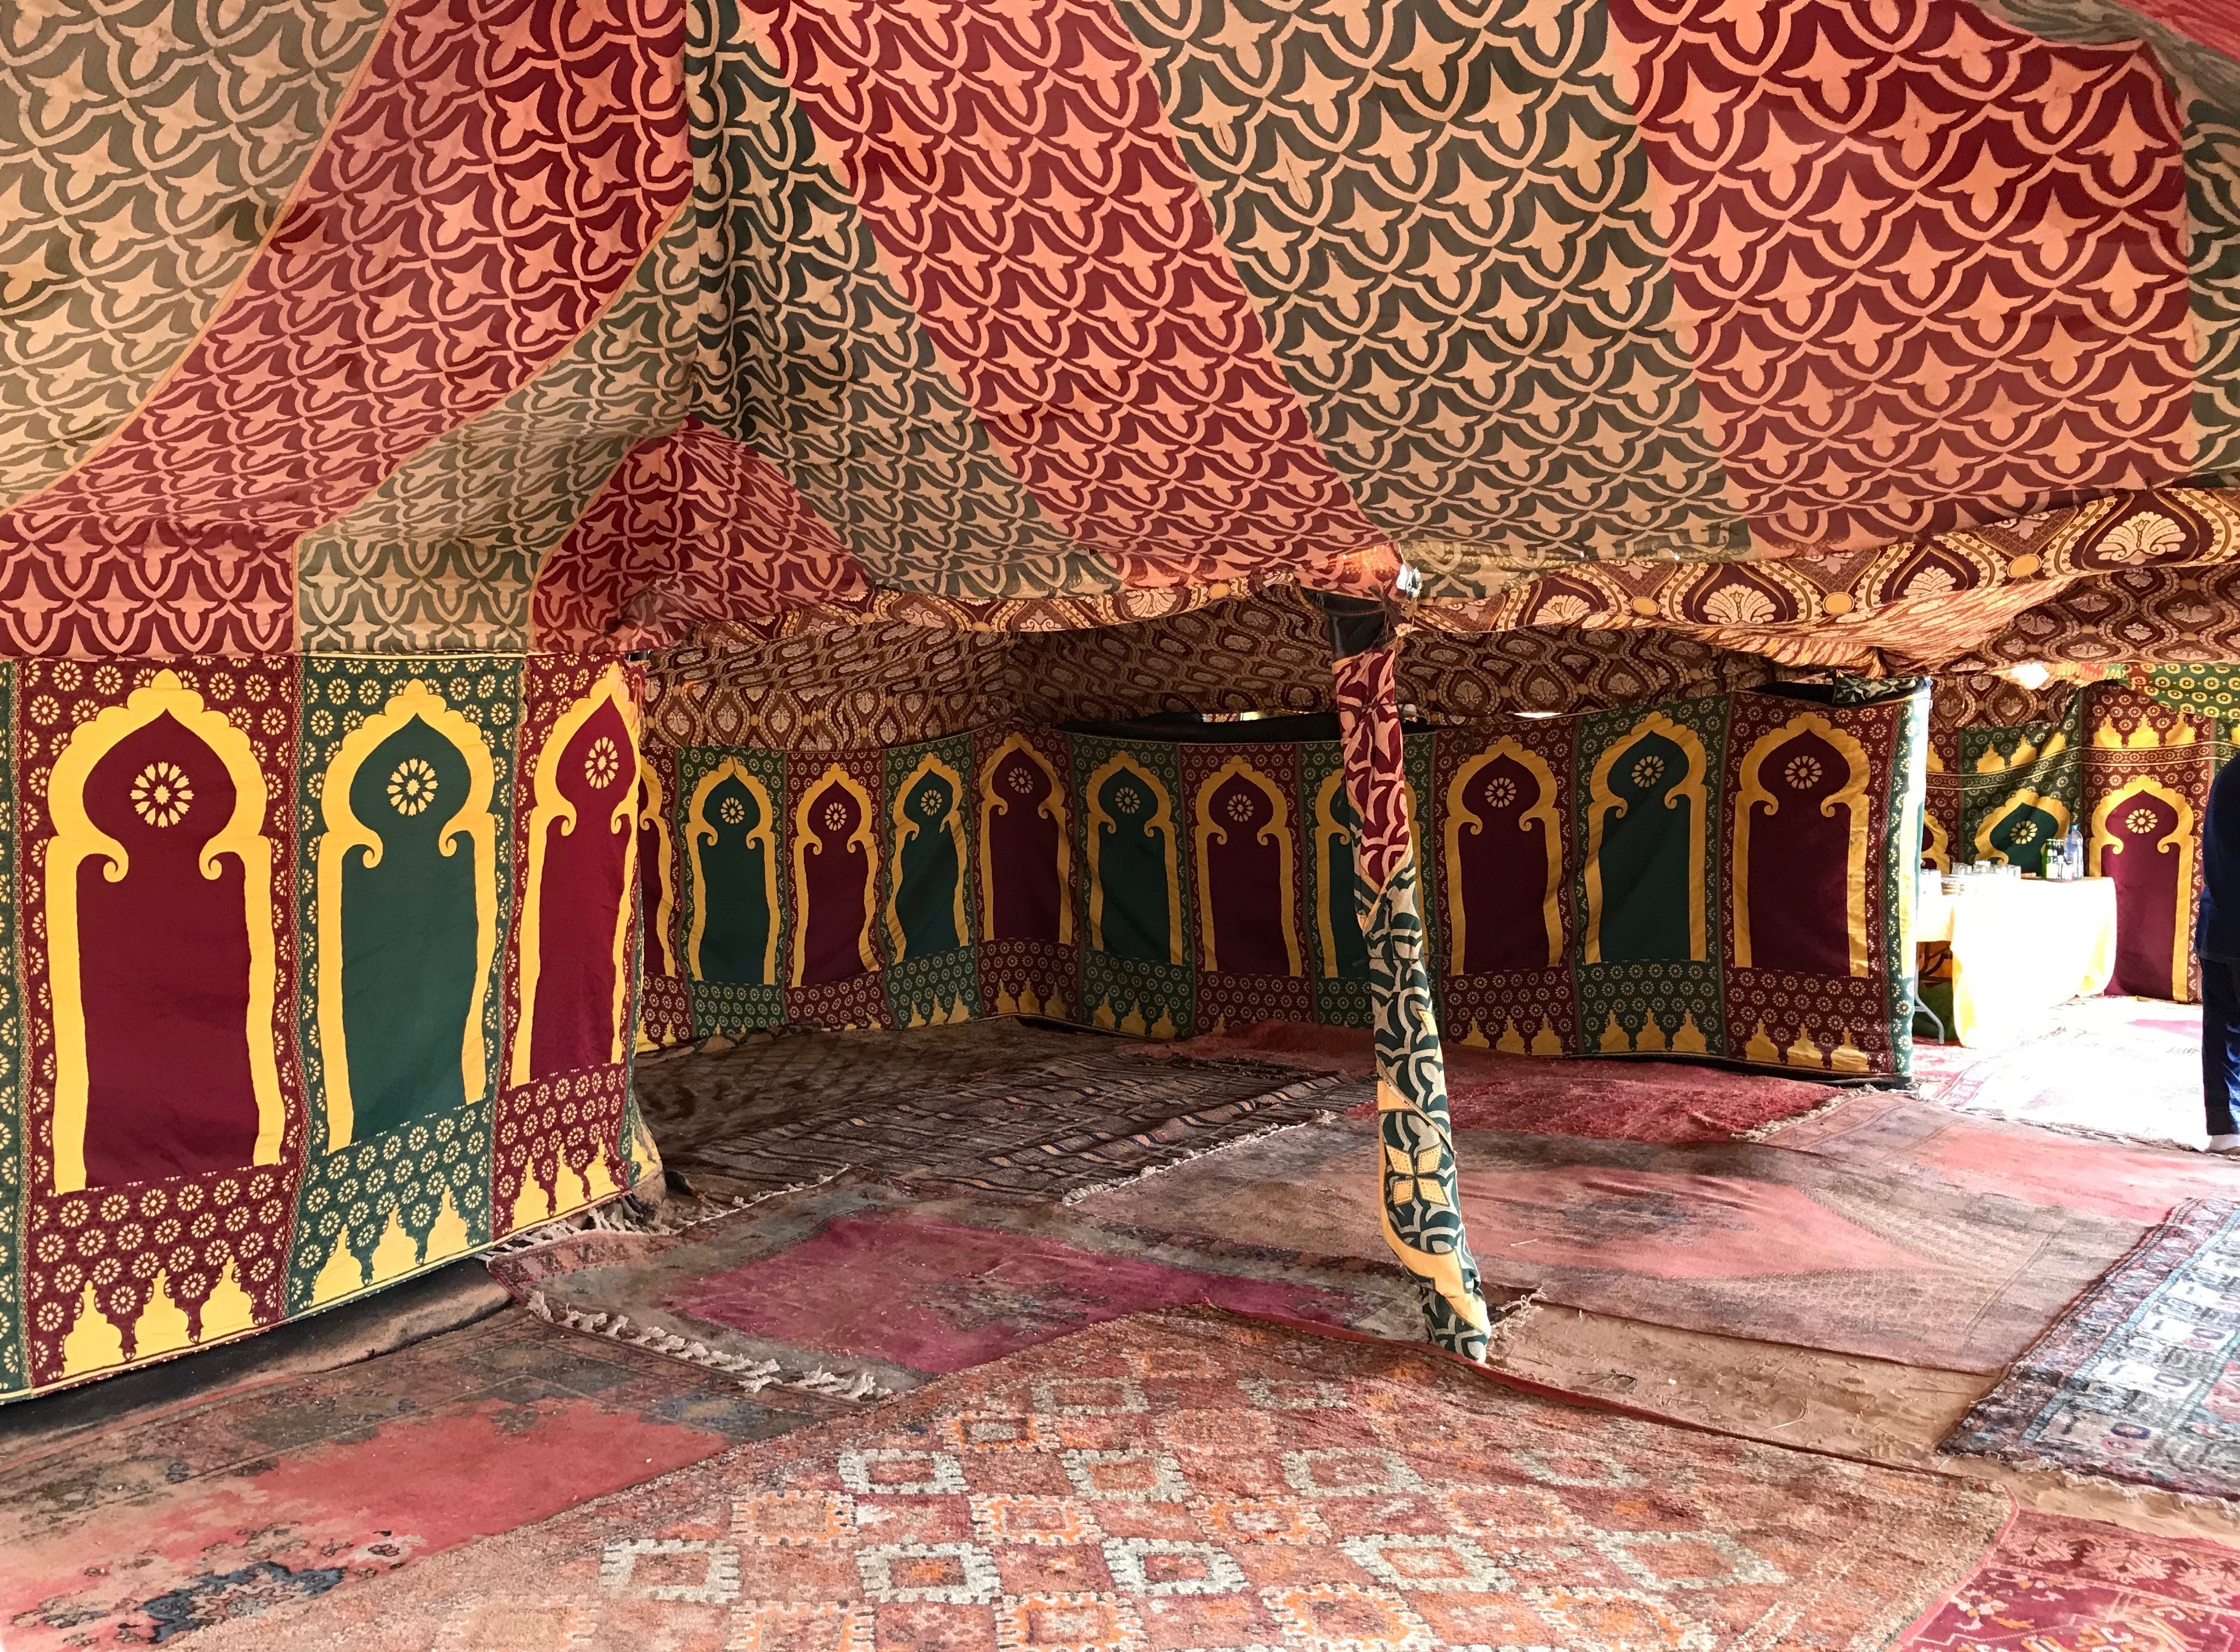 Moroccan tent for desert picnic